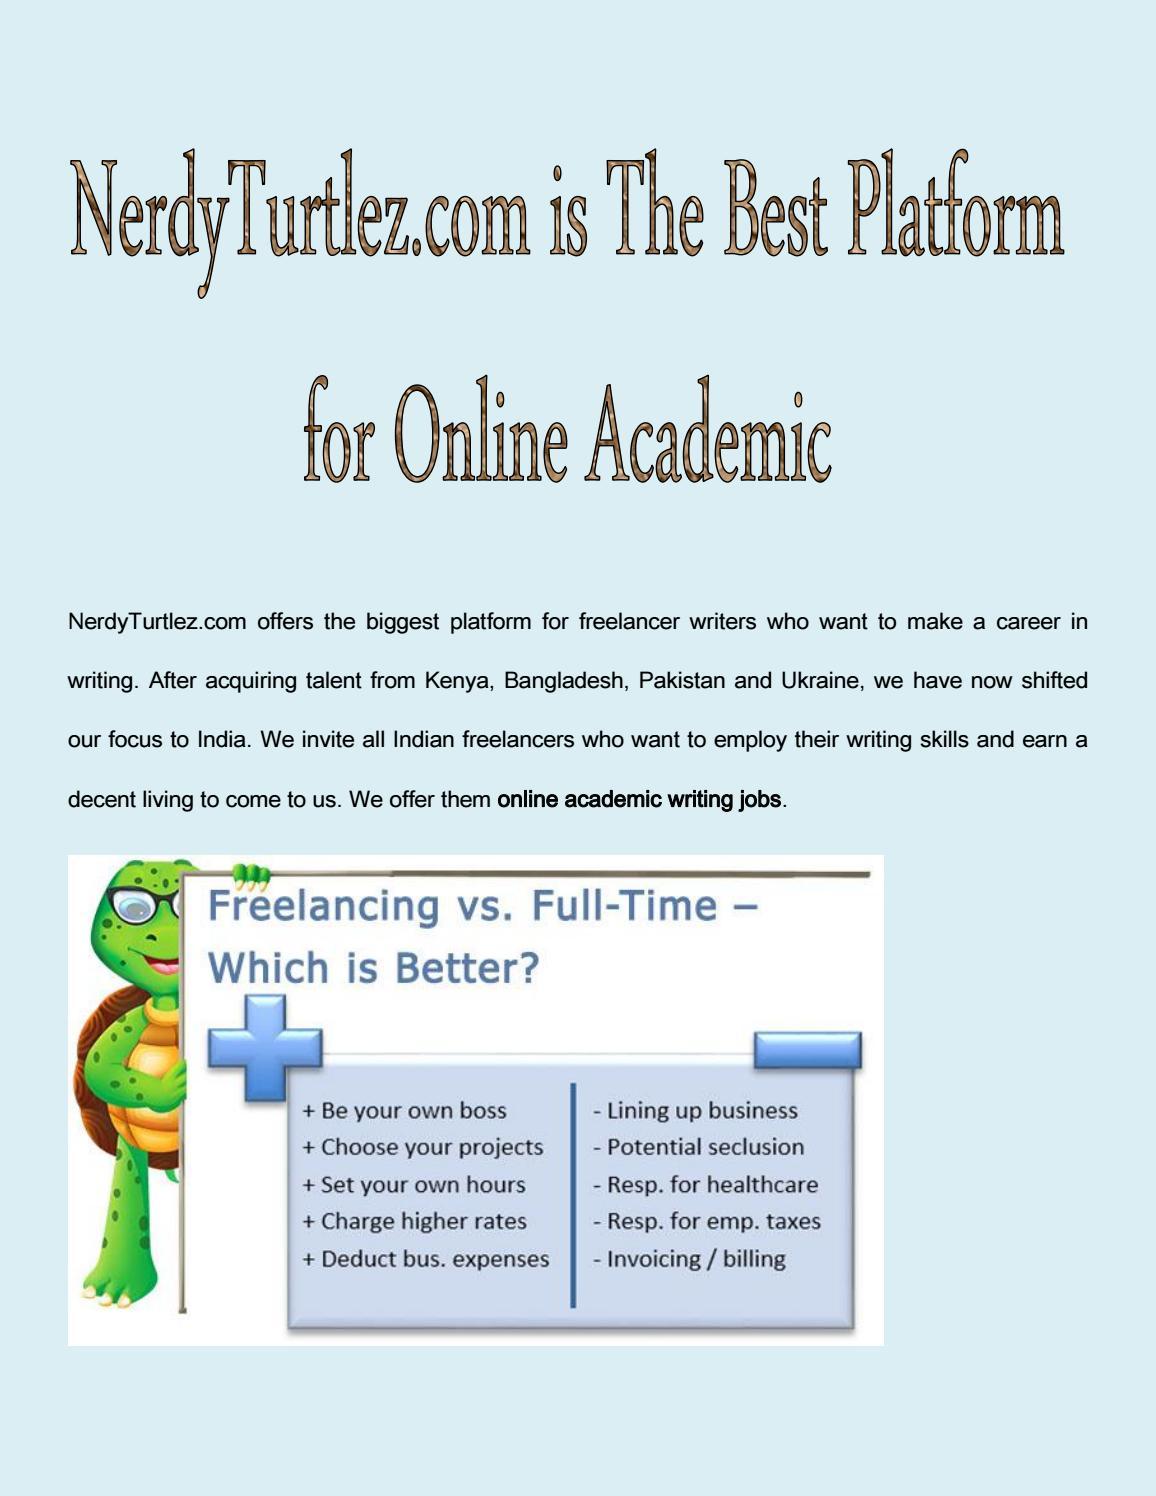 nerdyturtlez com is the best platform for online academic writing nerdyturtlez com is the best platform for online academic writing jobs in by mac larry